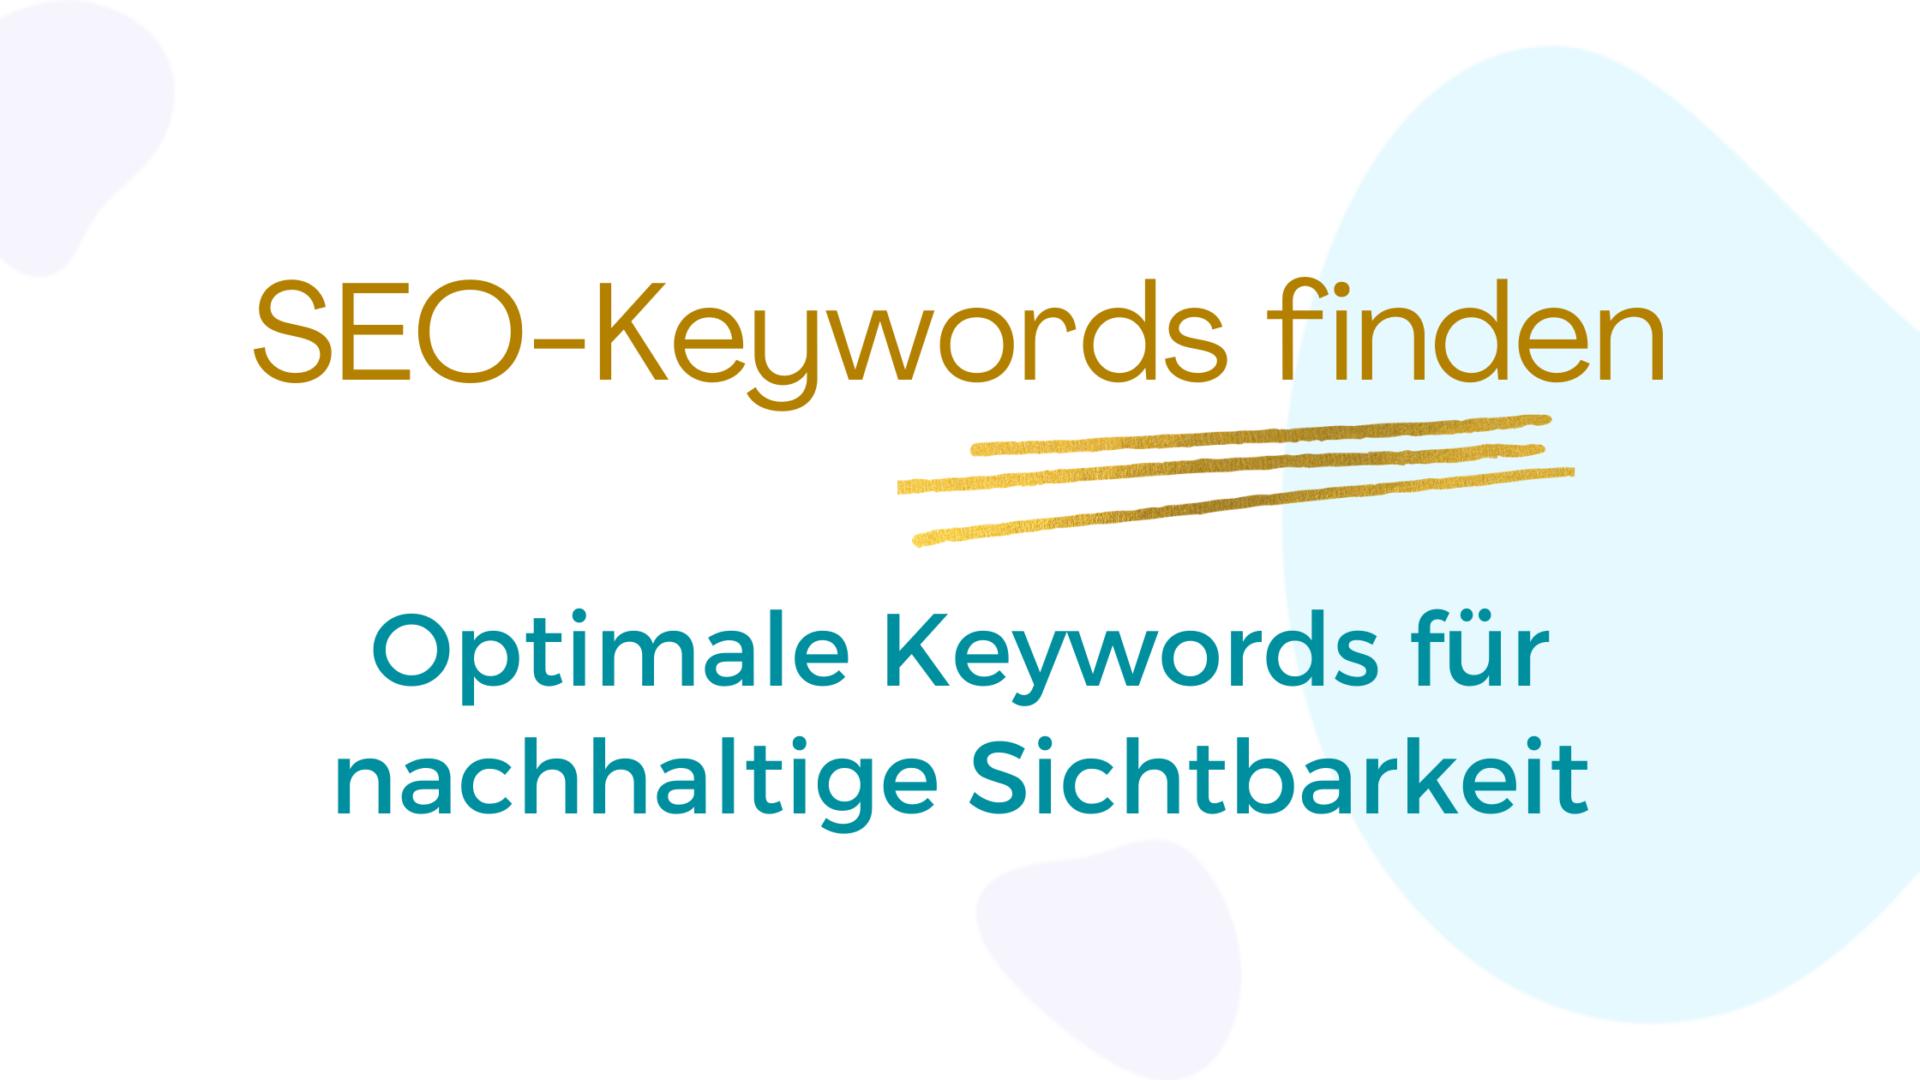 SEO Keywords finden